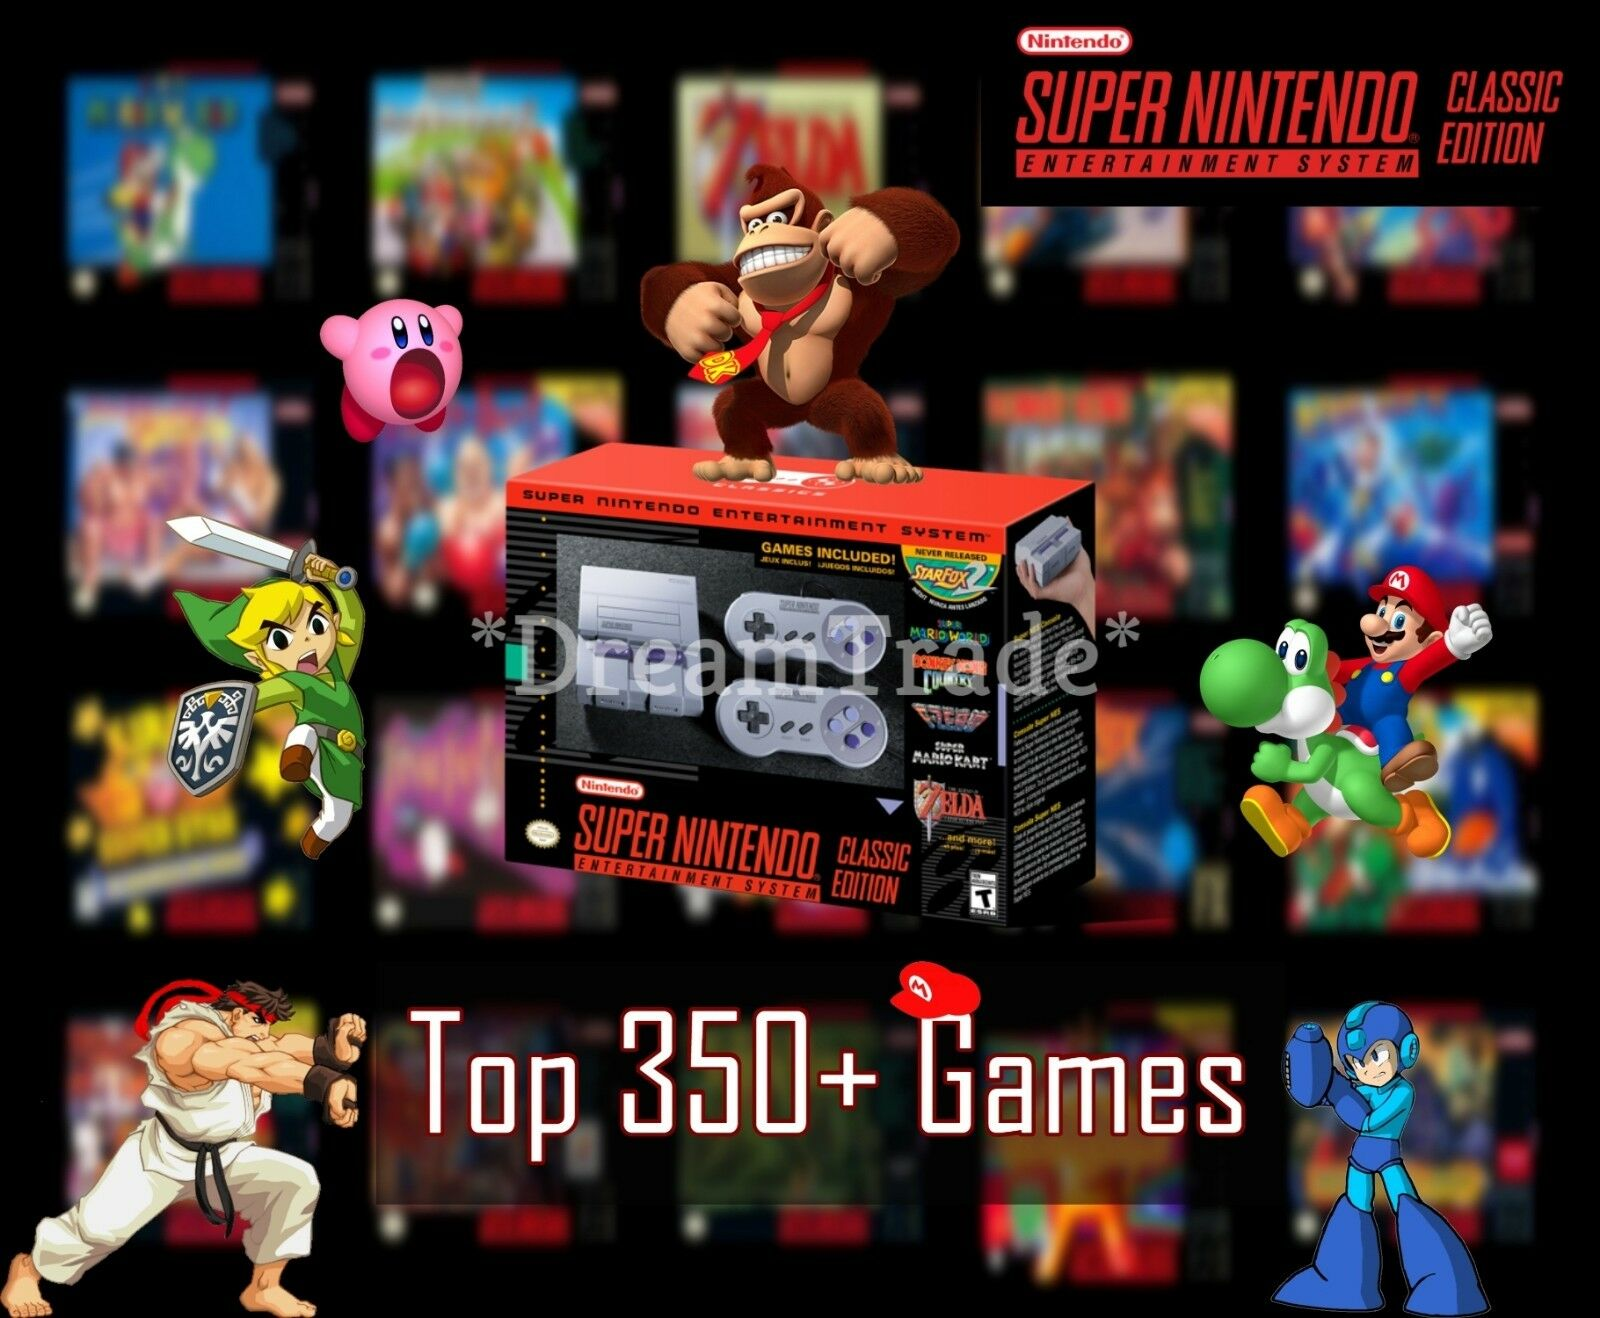 Super Nintendo Classic Edition Console SNES Mini Entertainment System 350+ Games